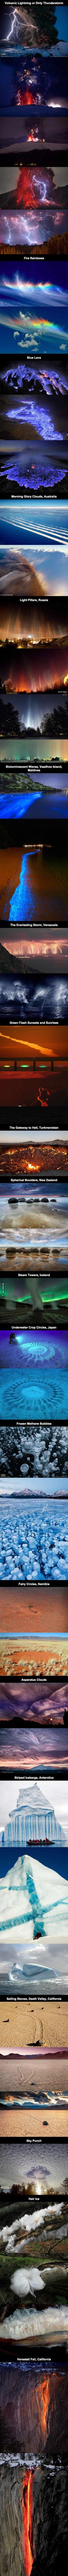 Awesome Natural Phenomena